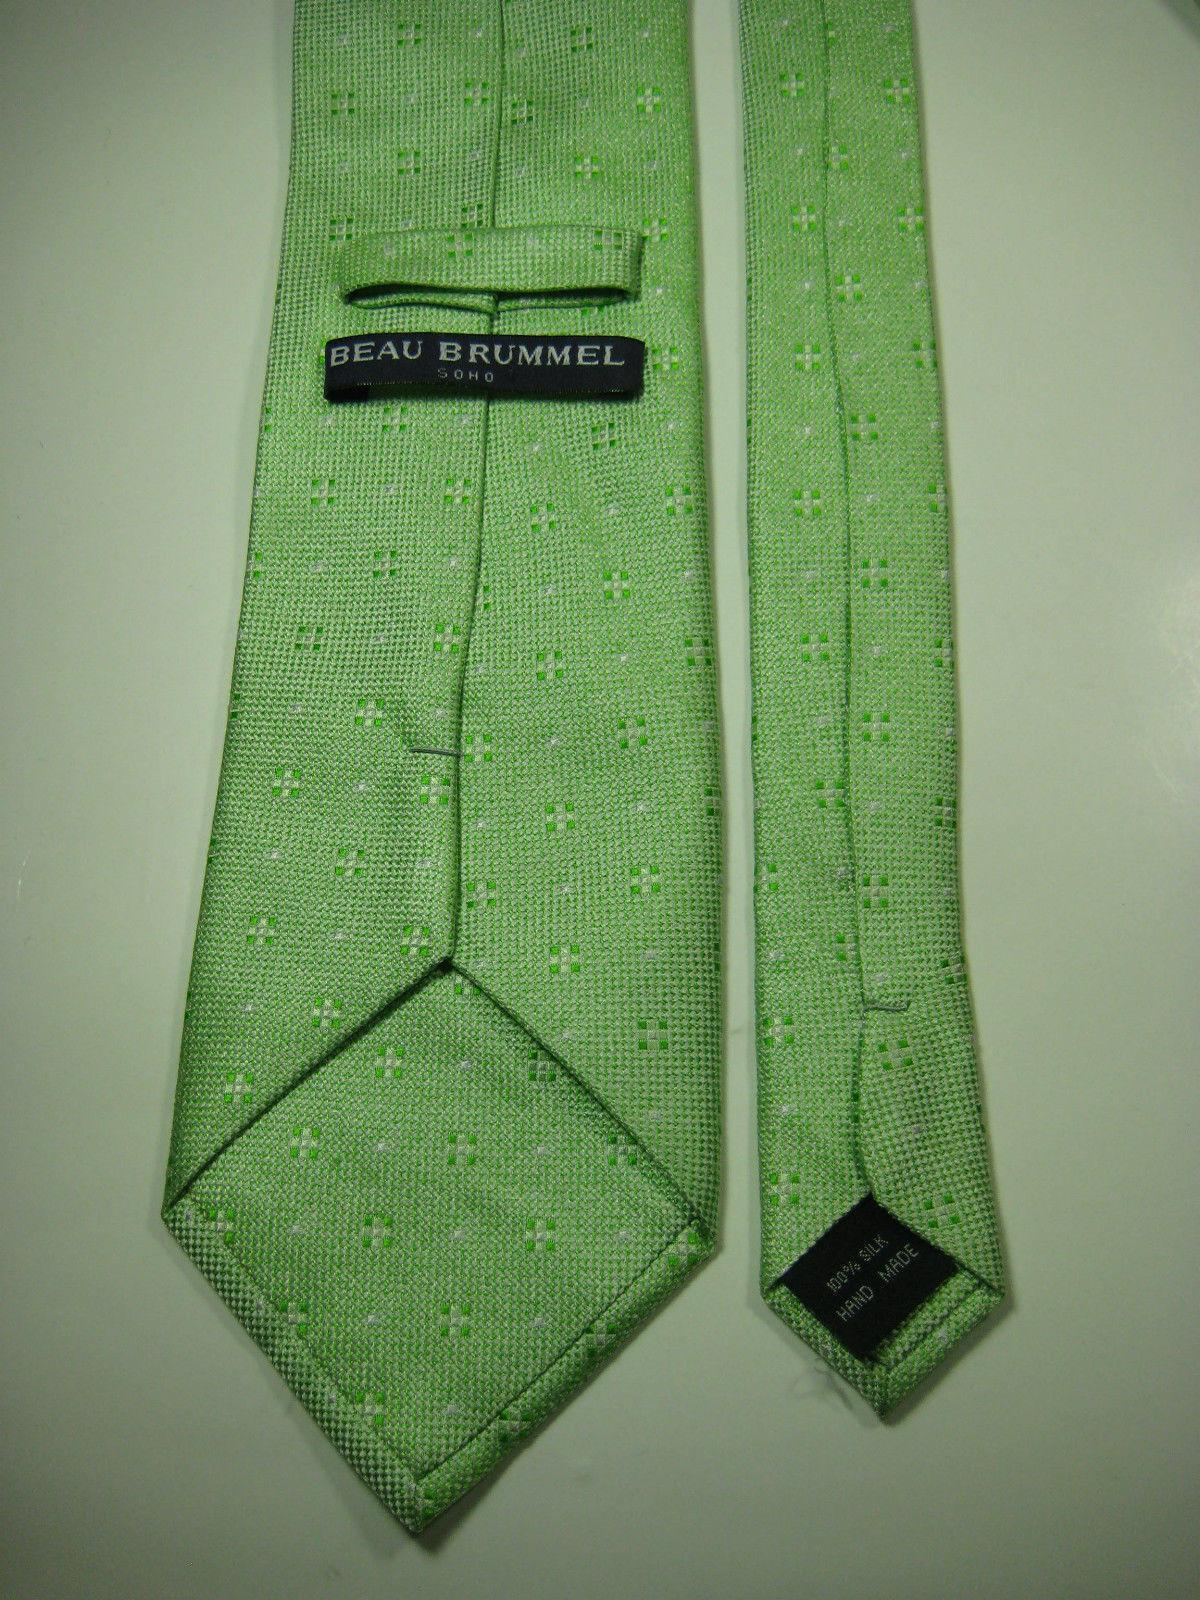 BEAU BRUMMEL Light Lime Green Geometric  Tie 100% Silk RARE EUC